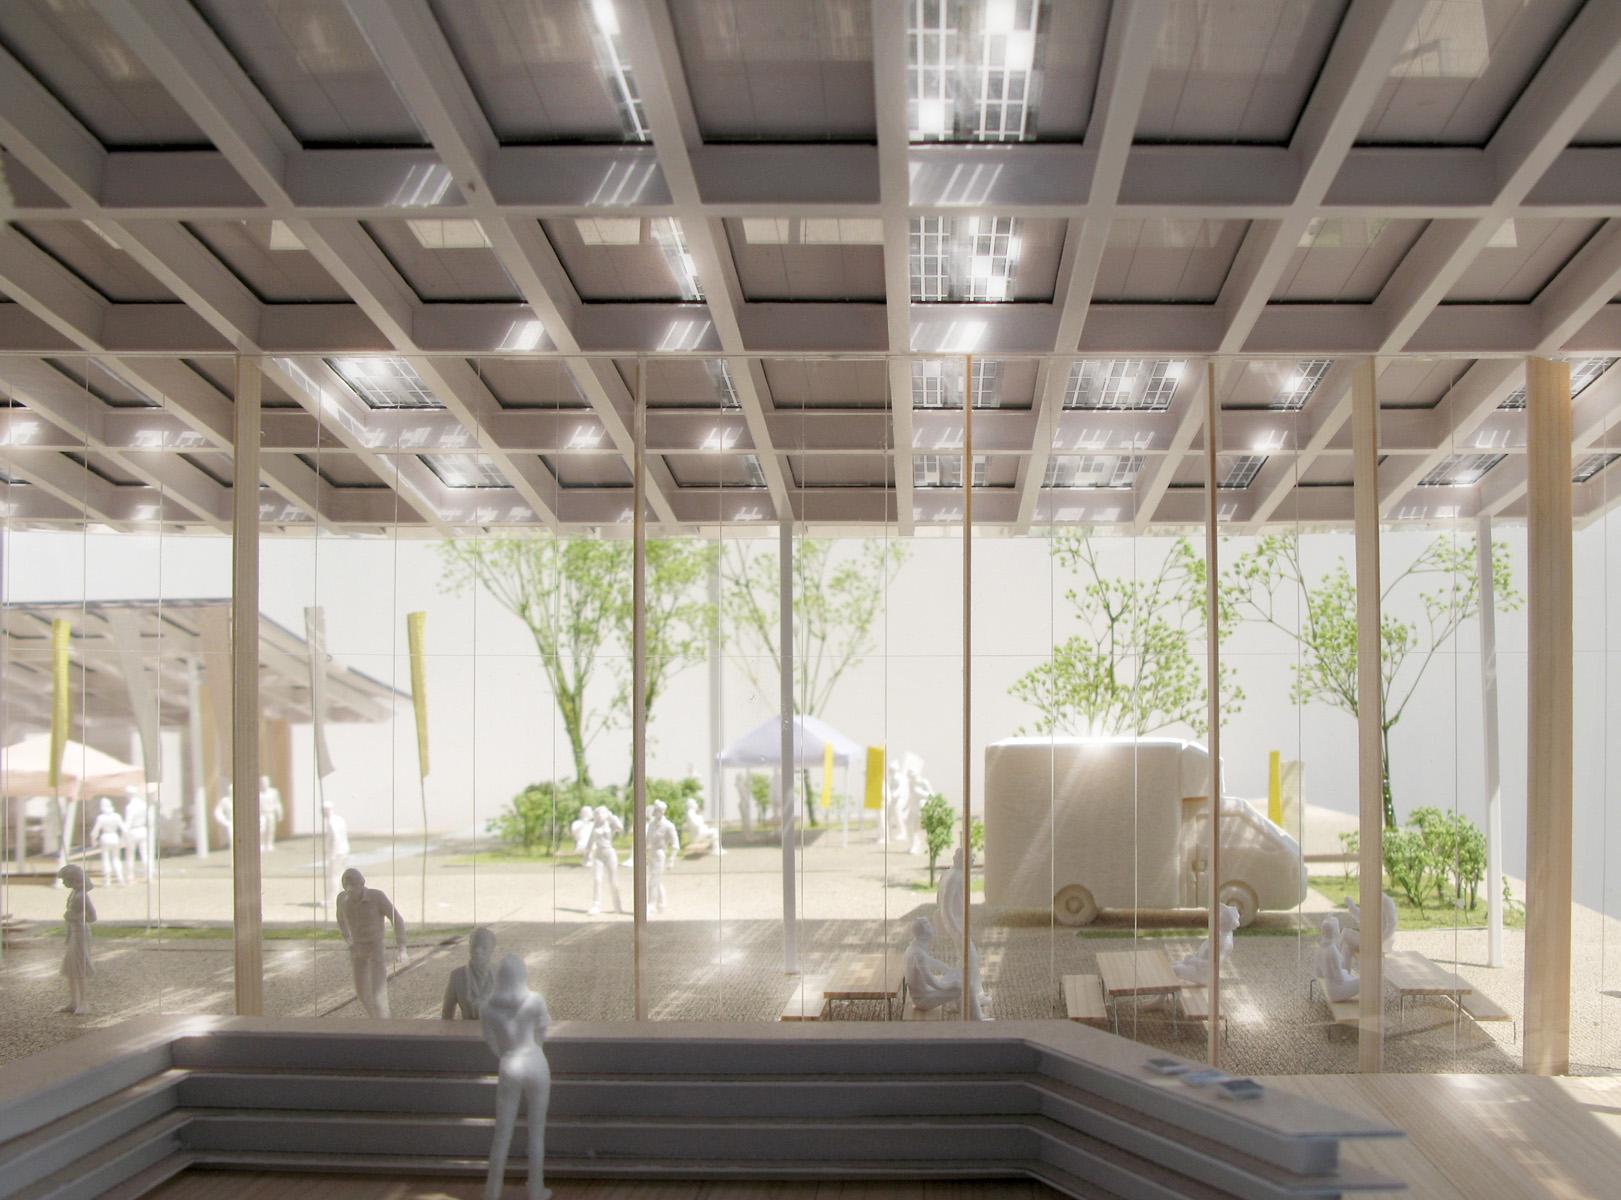 Tomioka City Hall Proposal 富岡市役所プロポーザル最優秀選定 News